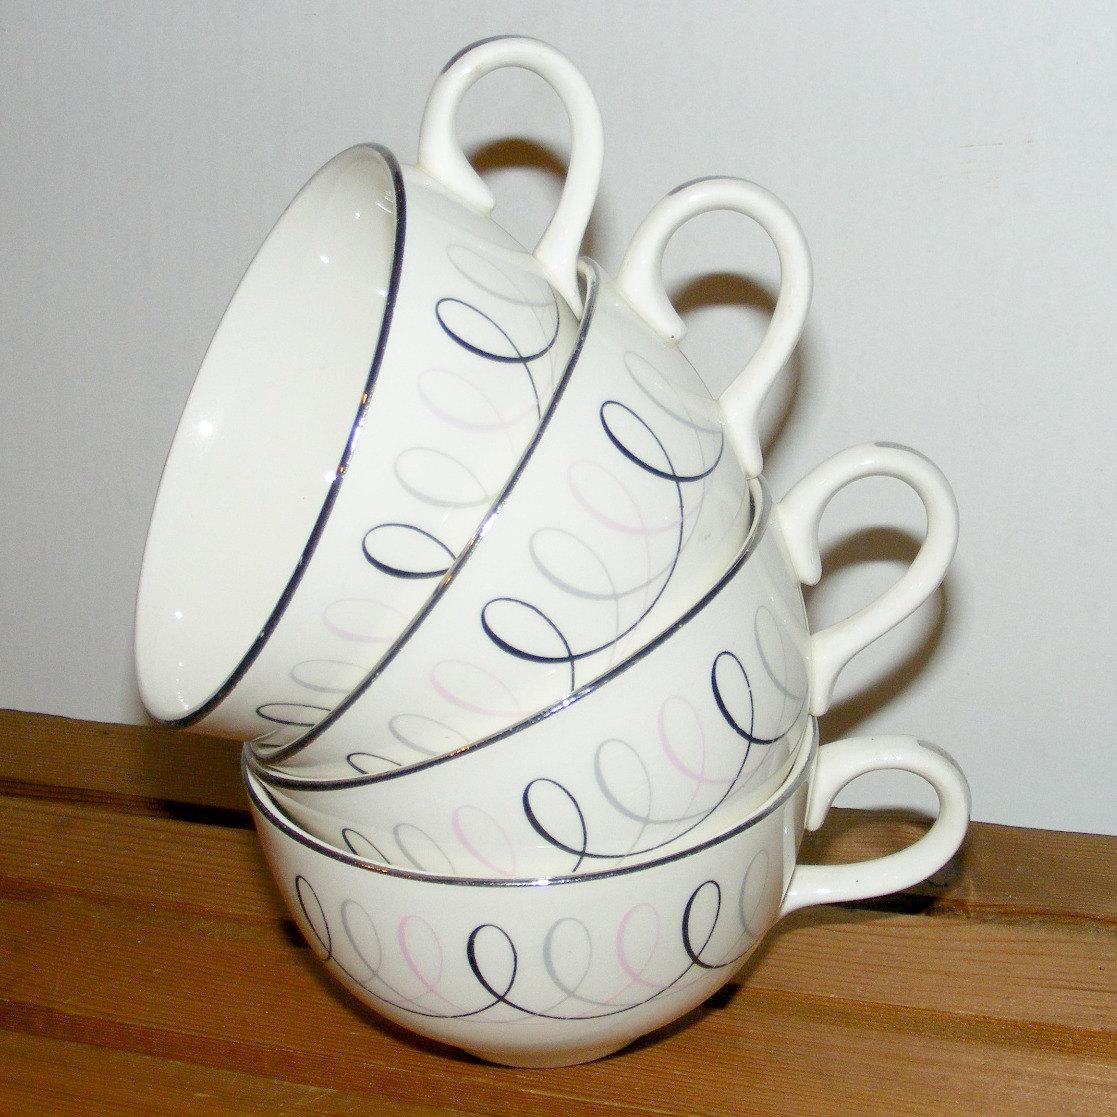 Atomic Era 4 Sevron Carousel Cups 1950s by MaryJanesVintageShop